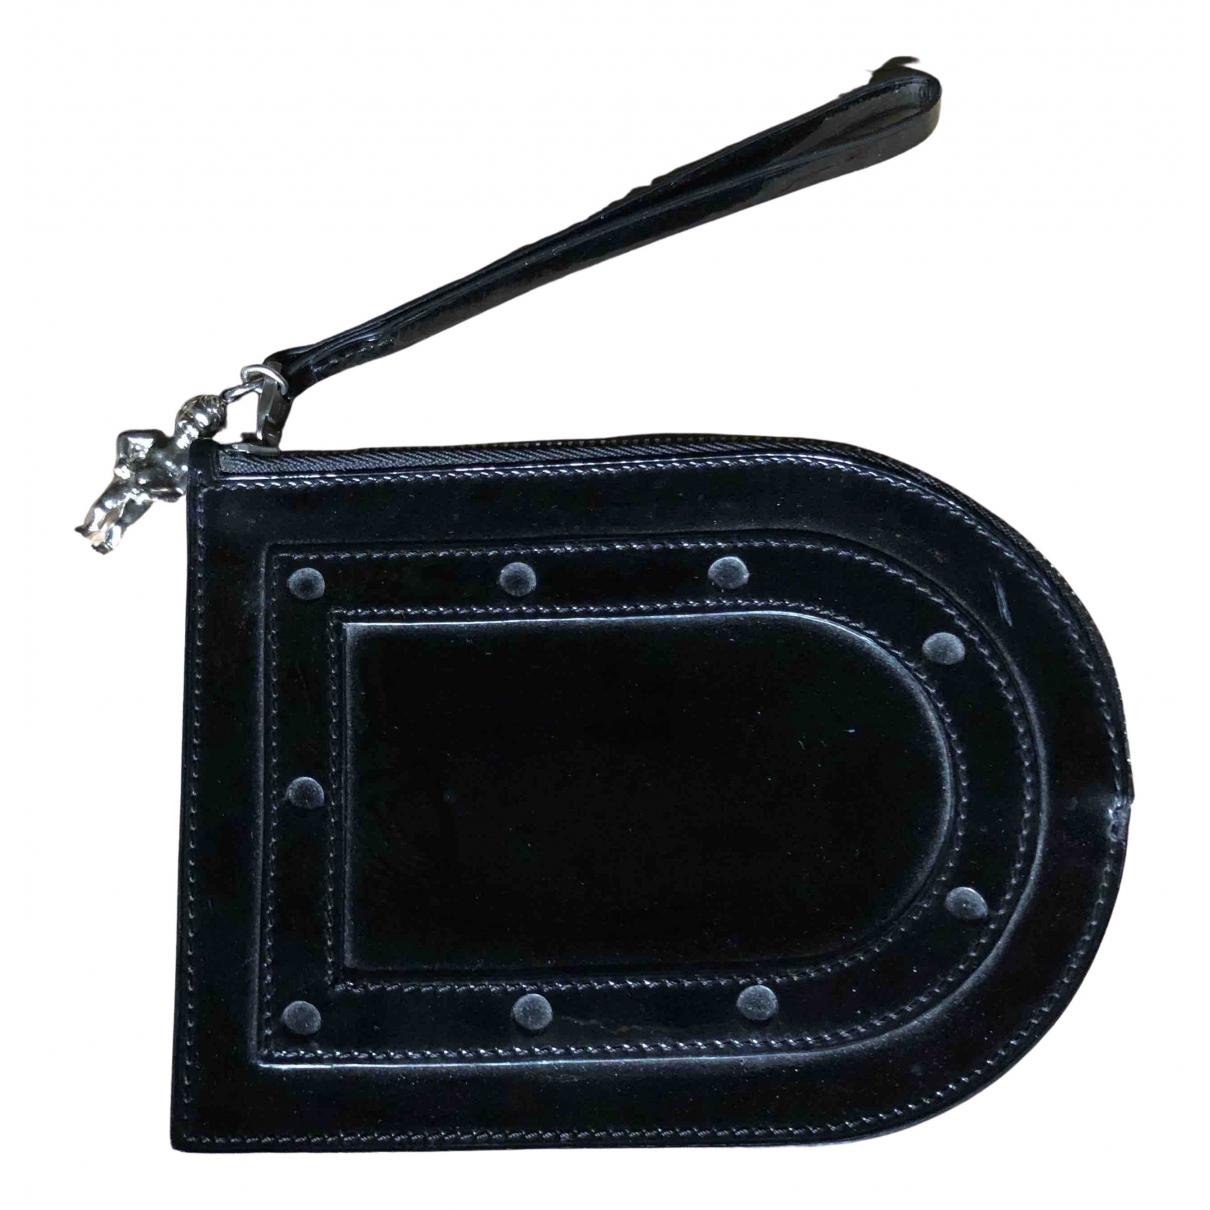 Delvaux N Black Patent leather Purses, wallet & cases for Women N